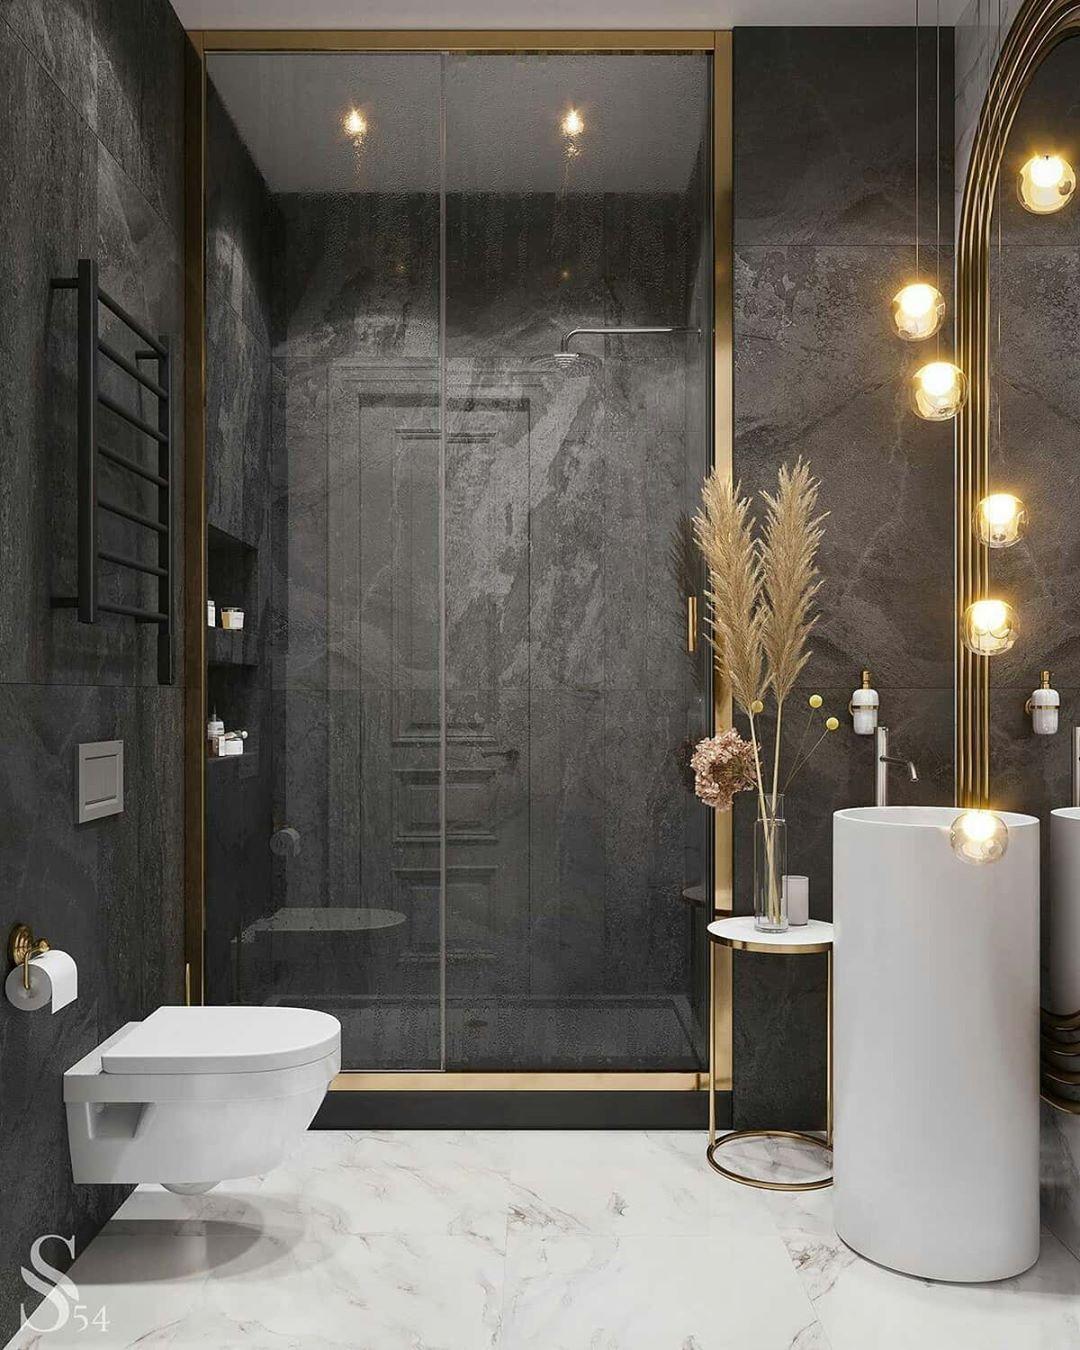 Pin By Chane Beukes On دورات مياه مودرن Bathroom Design Luxury Diy Bathroom Decor Bathroom Design